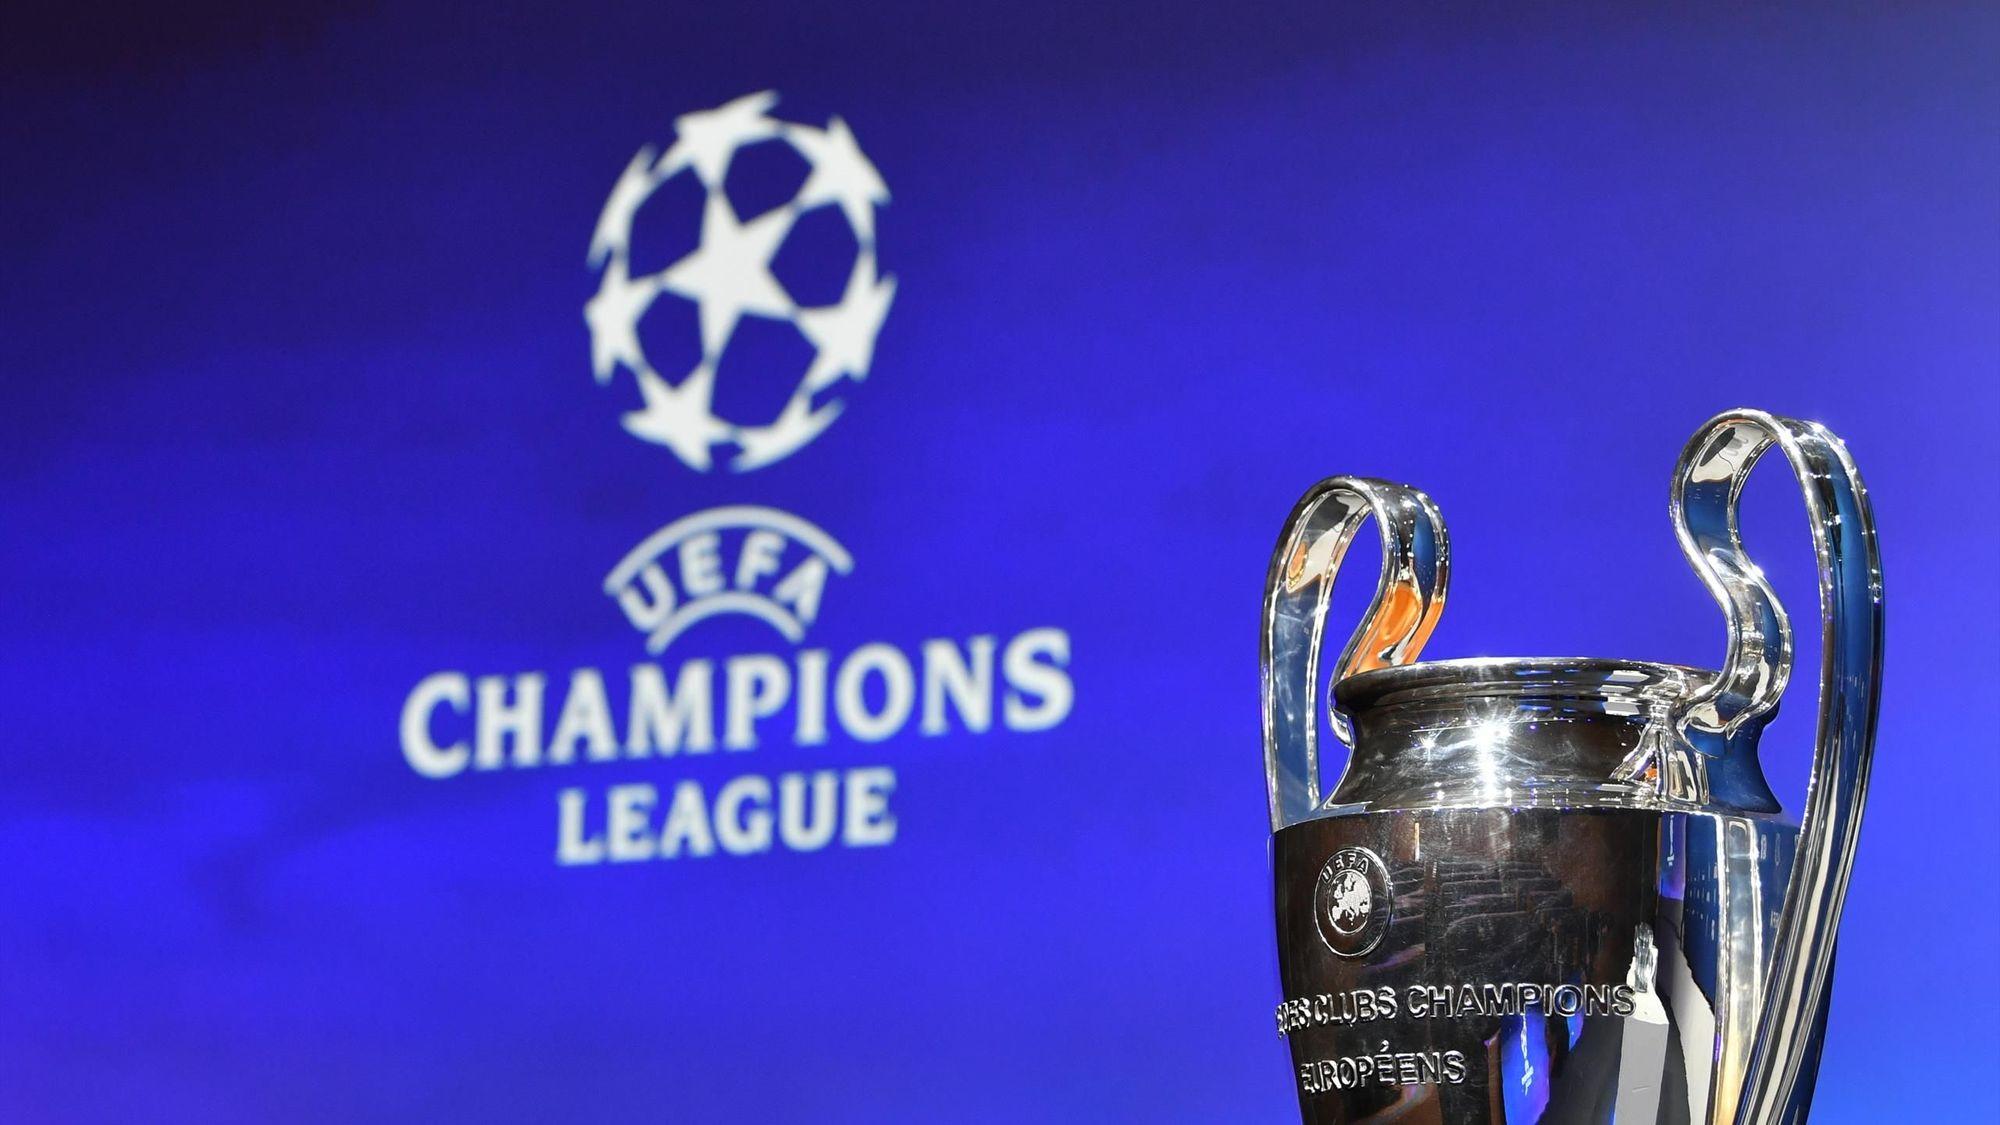 Pronostico Champions League 24/11/2020: Fase a gruppi 2020